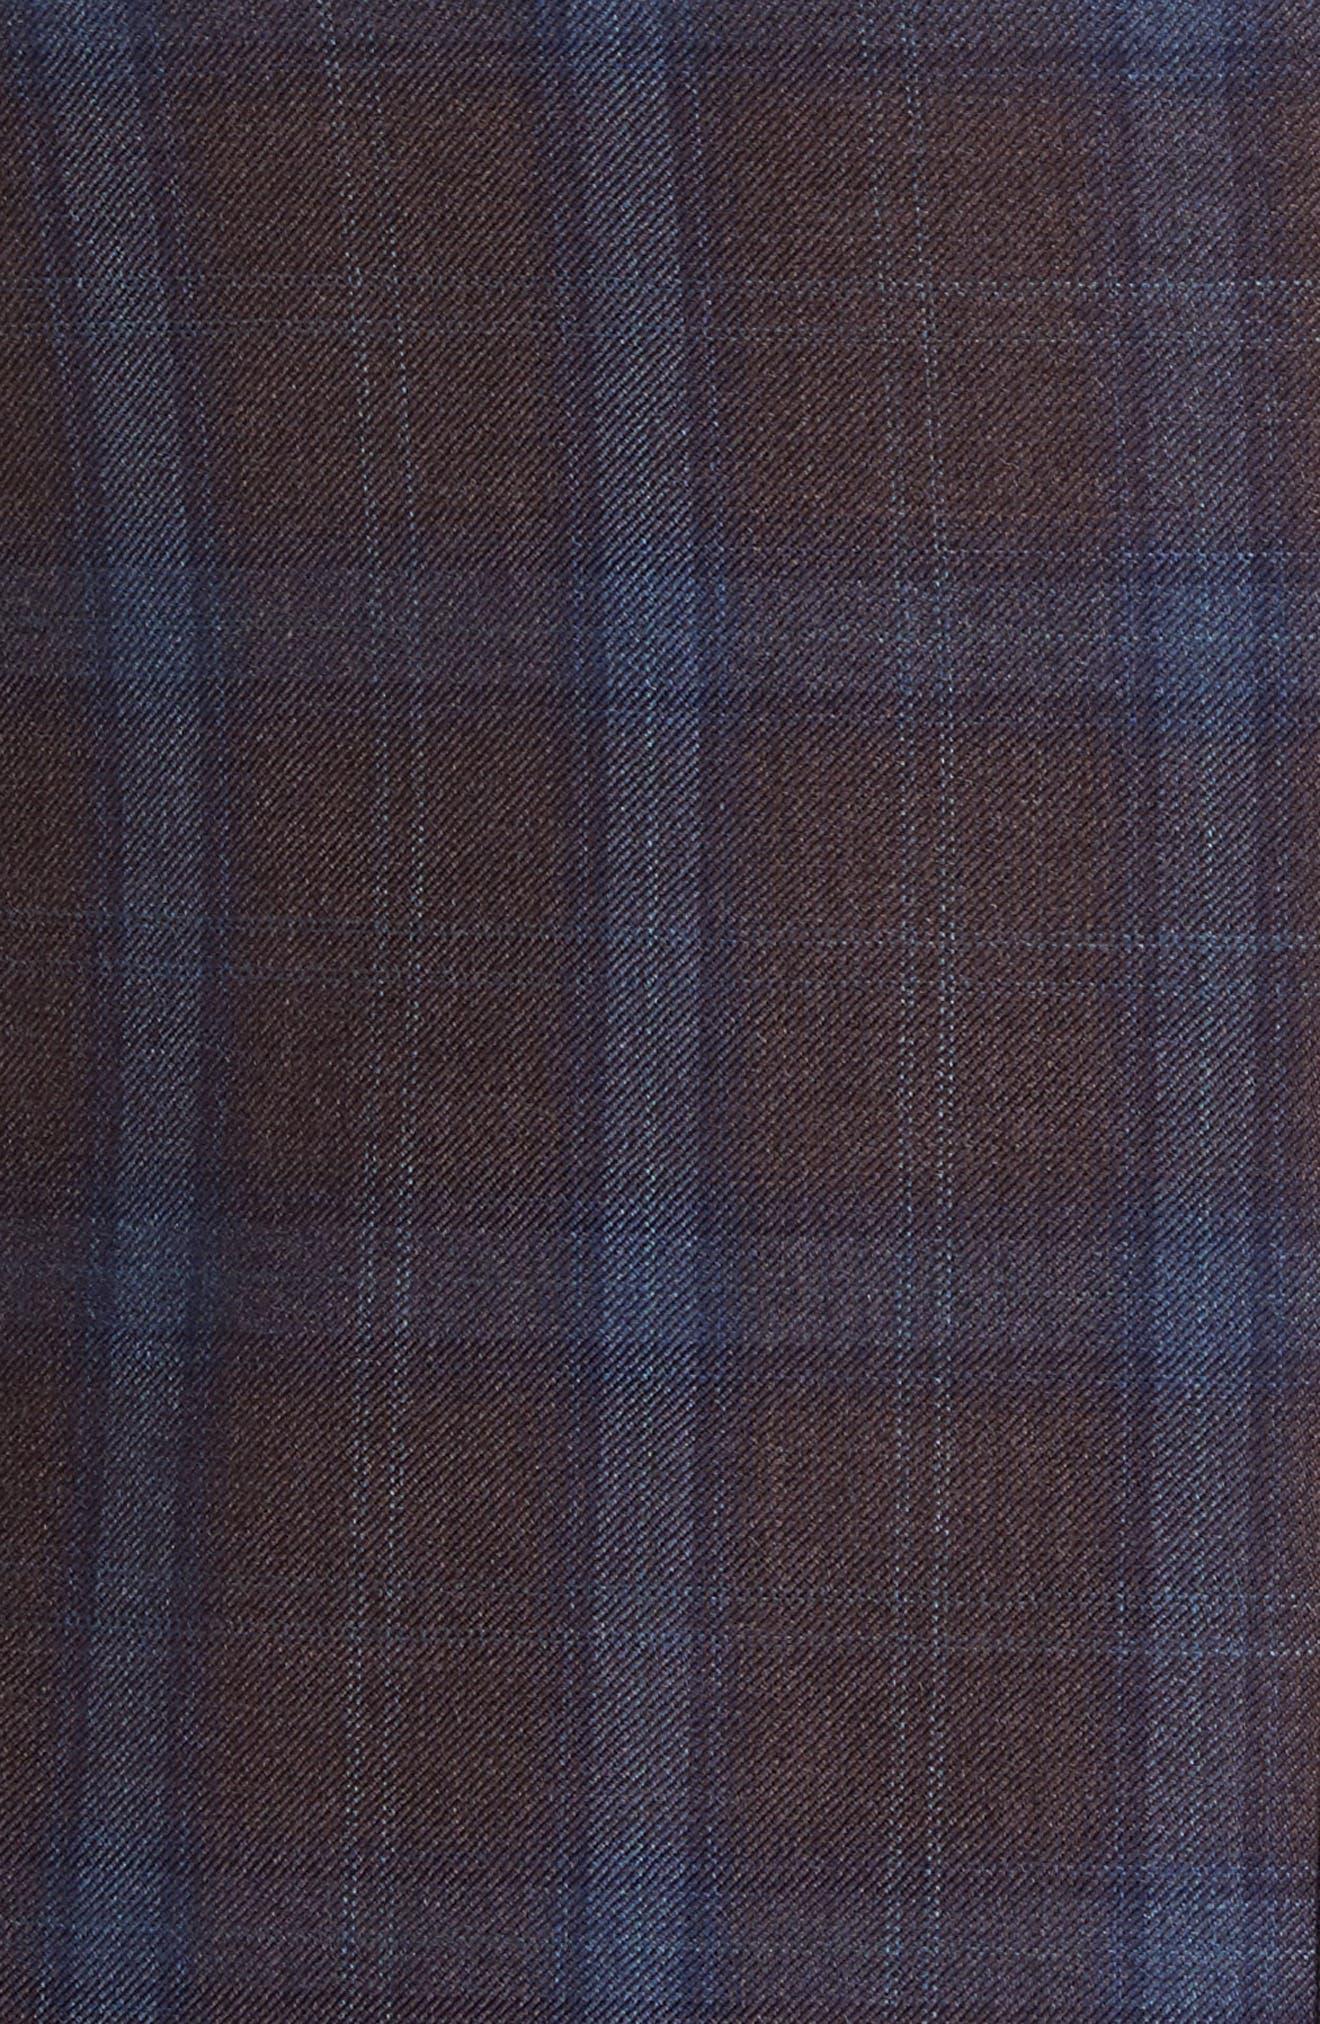 Jay Trim Fit Plaid Wool Sport Coat,                             Alternate thumbnail 6, color,                             932